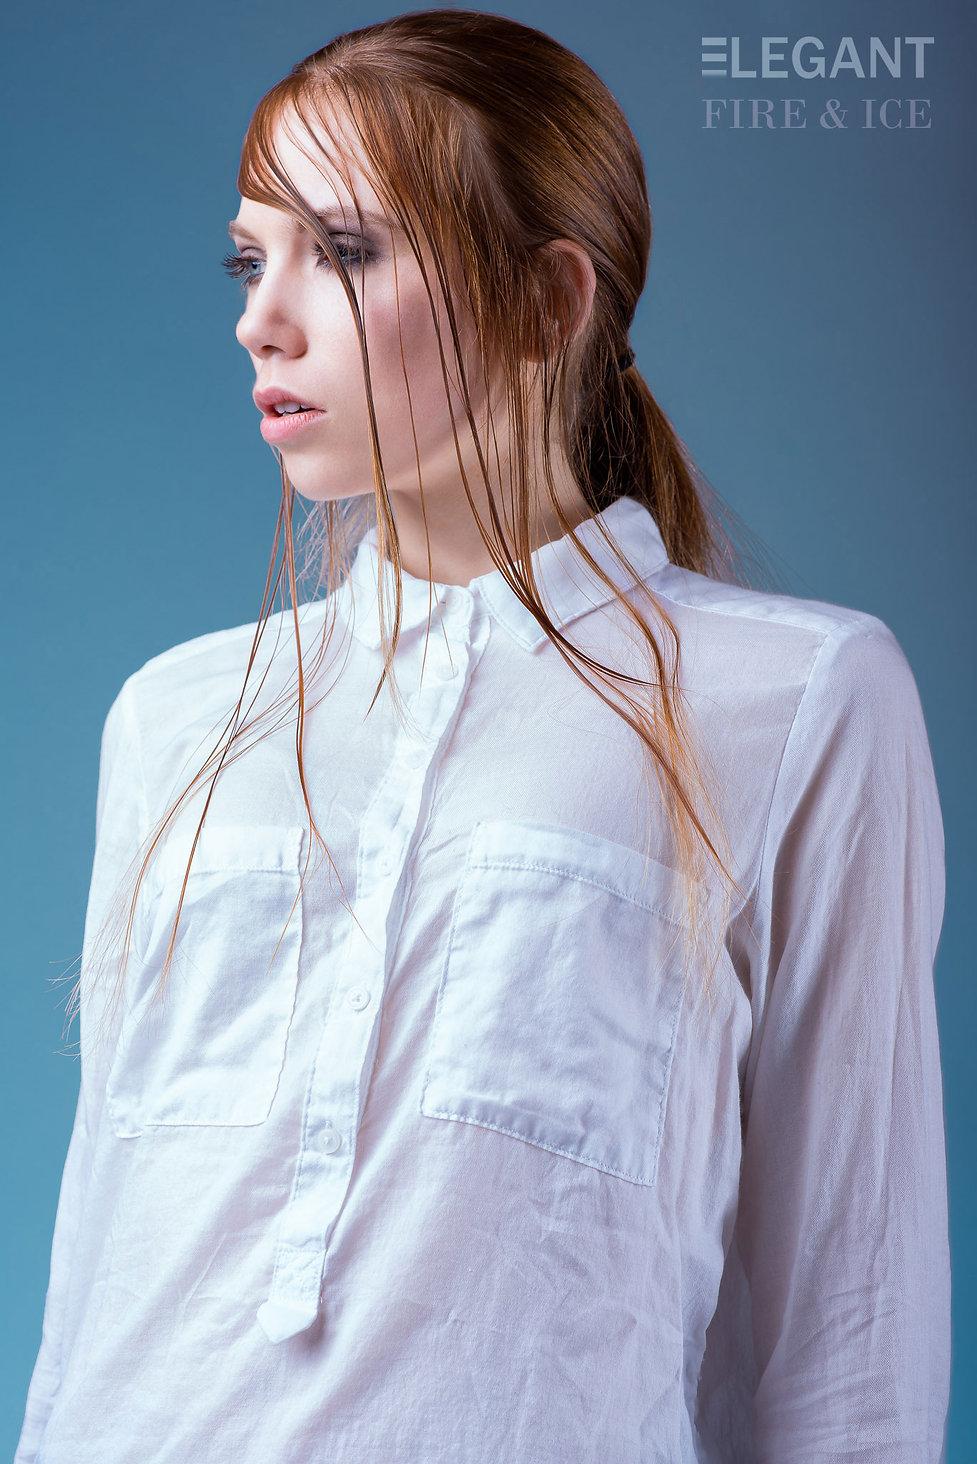 Fire&Ice Editorial Elegant Magazine Nikkis Sikkema Division Model Management